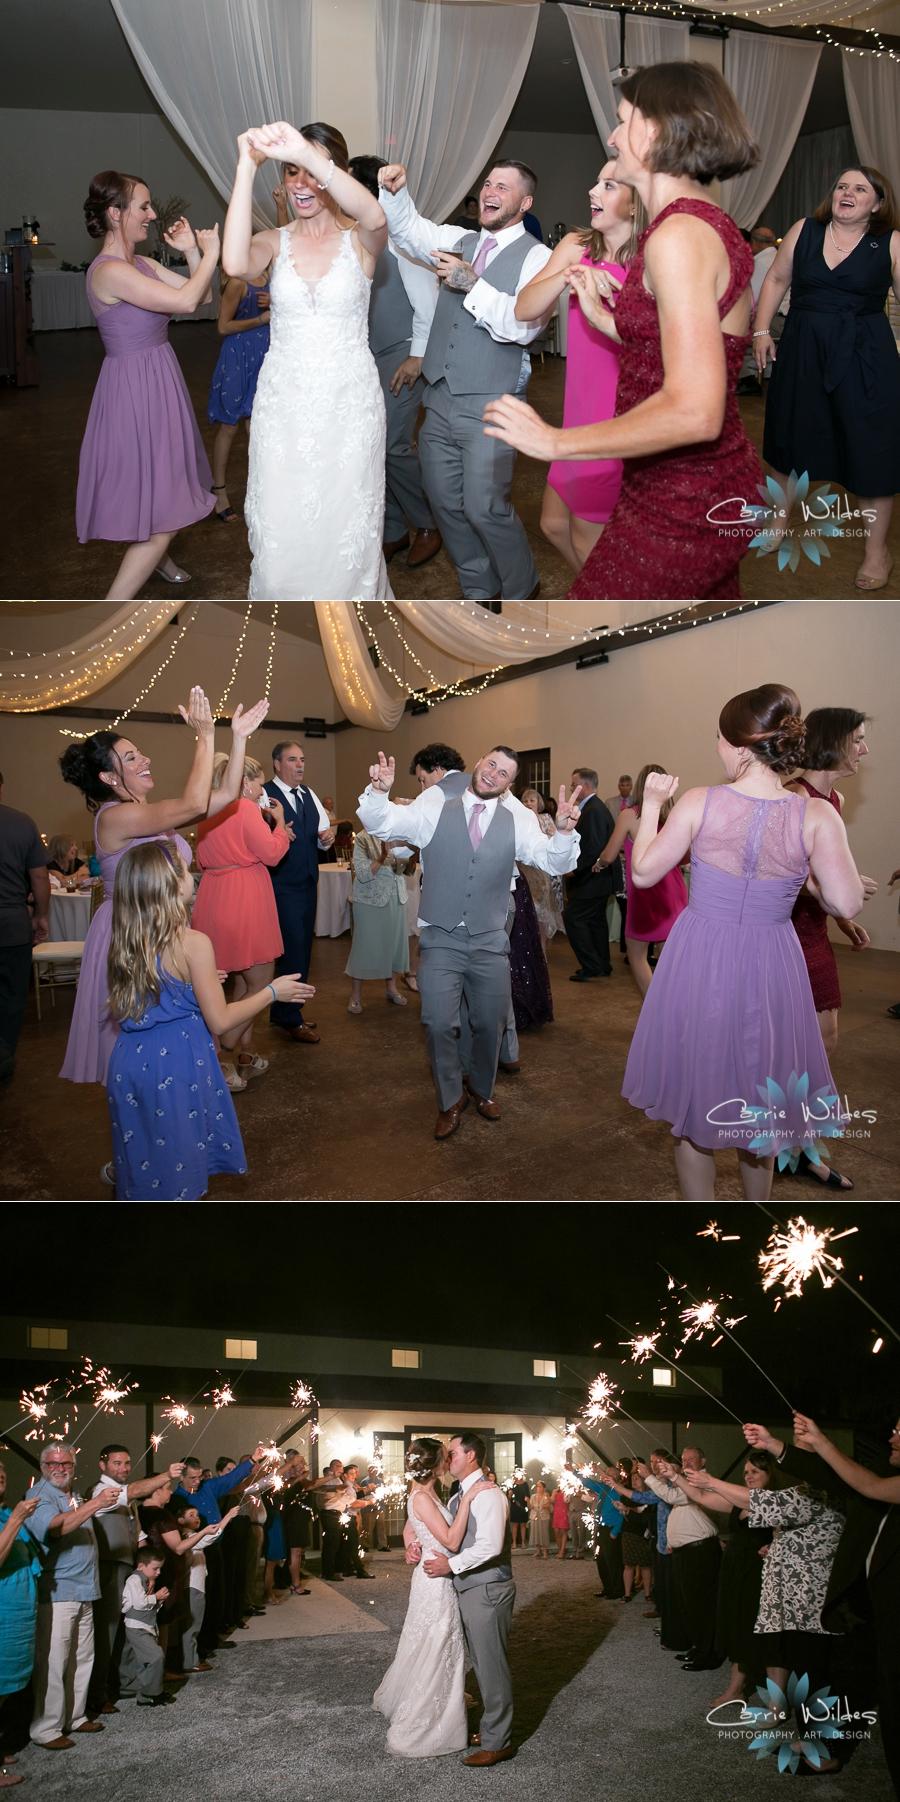 3_16_19 Bakers Ranch Wedding Marisa and Ricky Wedding_0055.jpg